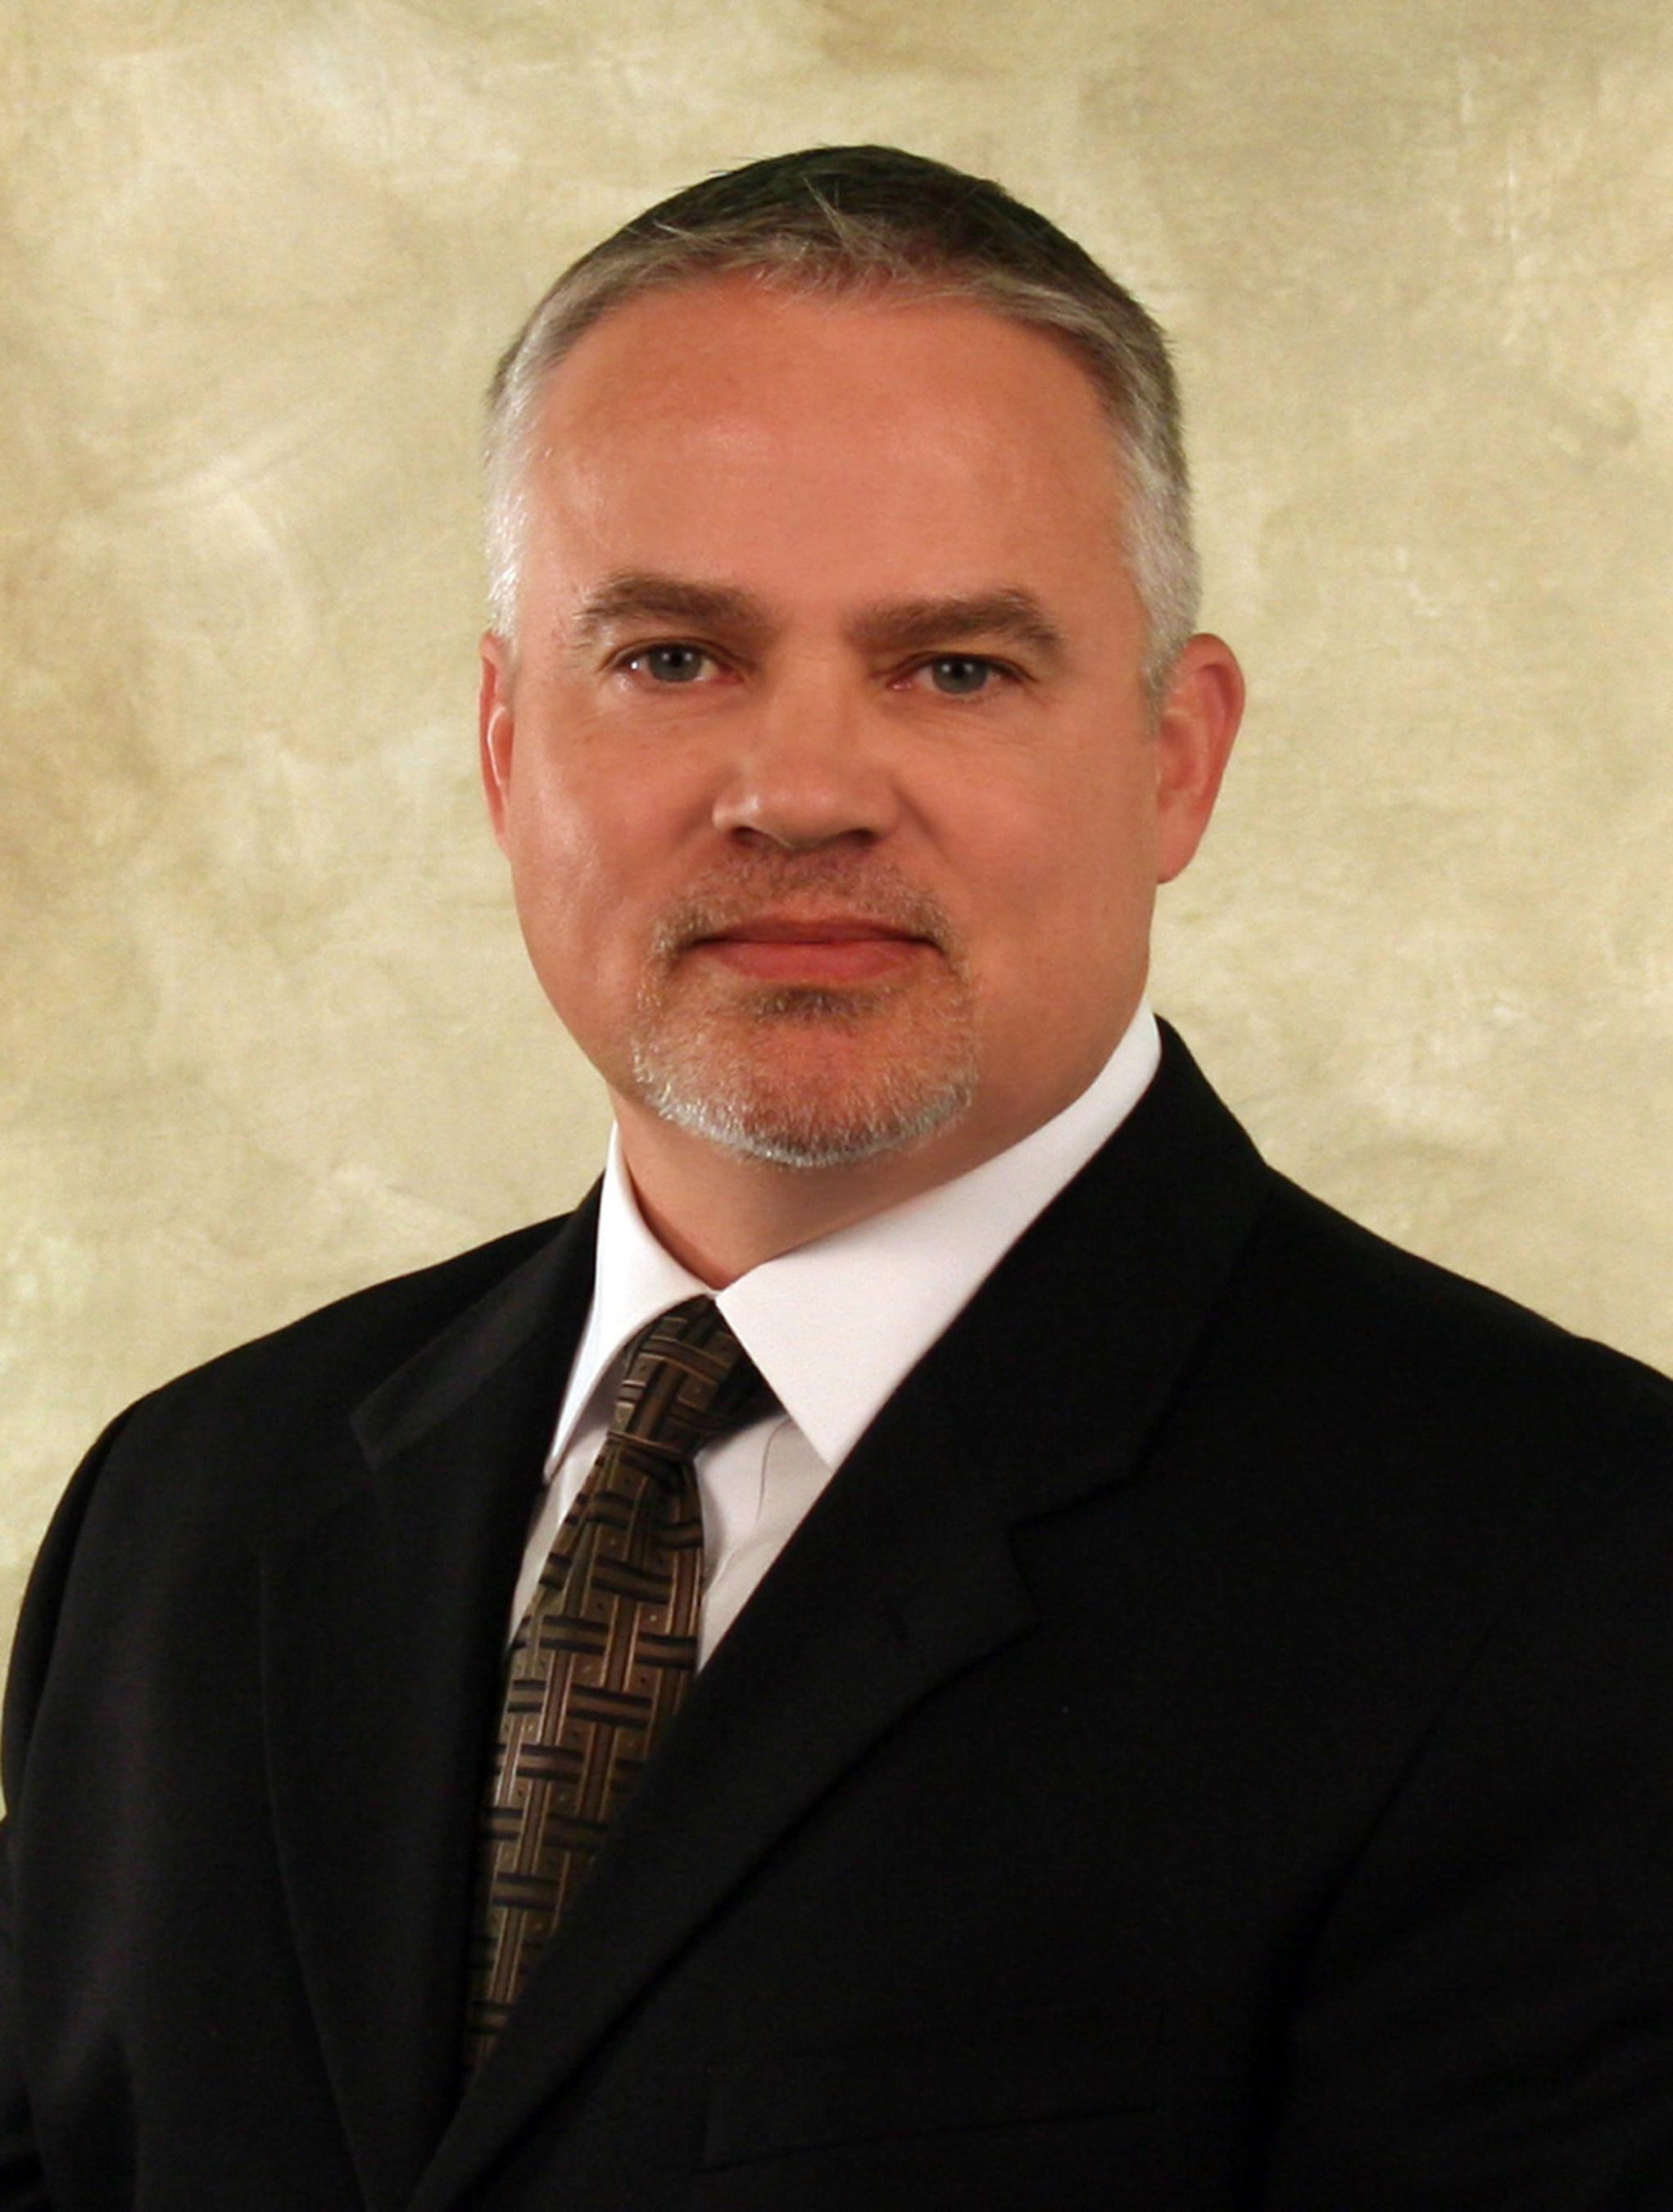 Steve Phillips joins TruStar Energy as Senior Vice President of Sales and Marketing.